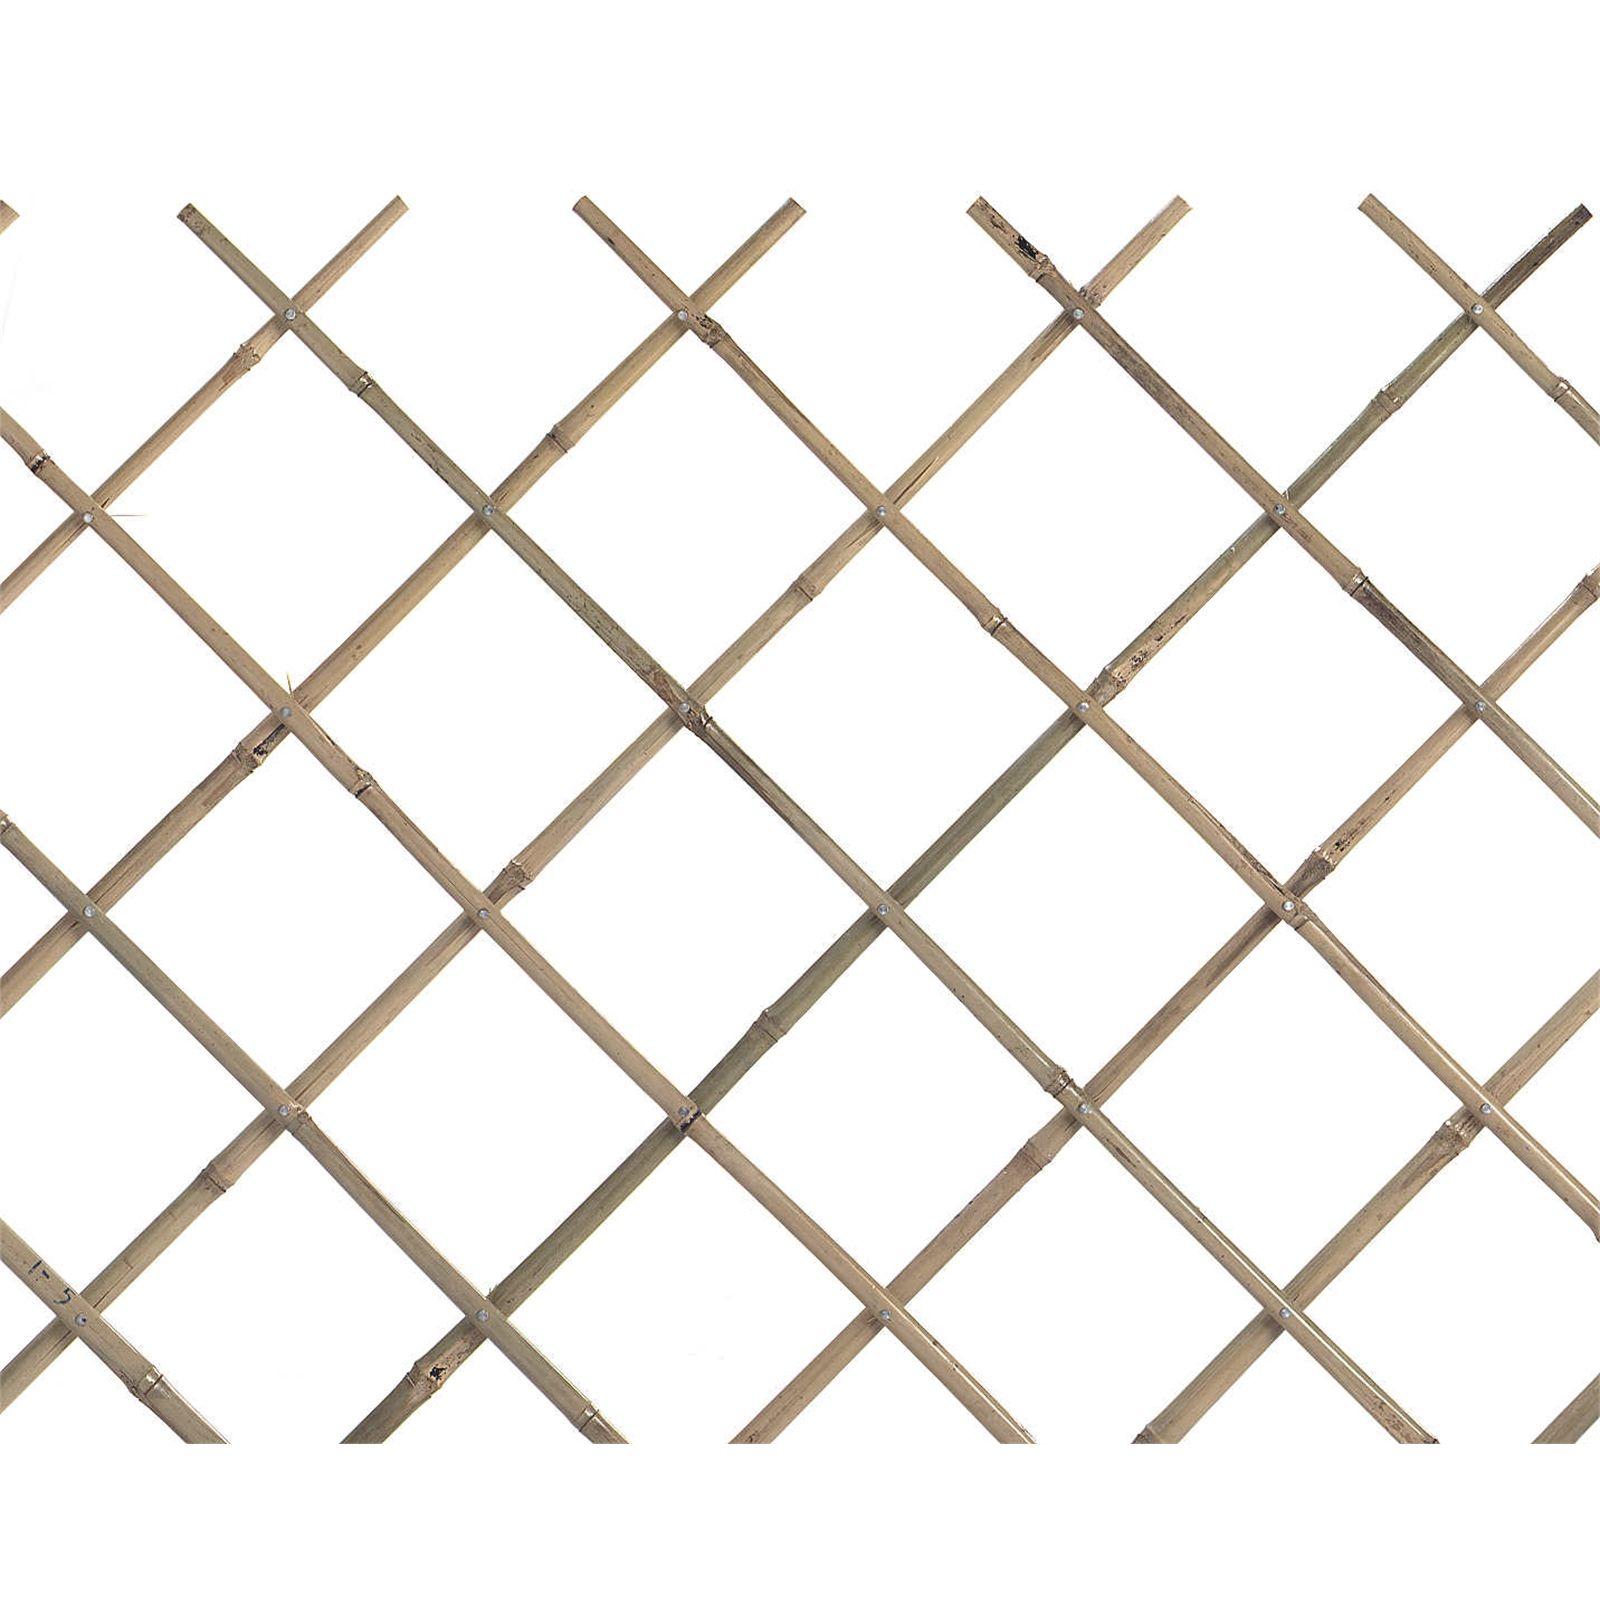 Garden Trend 1200 X 1800mm Bamboo Trellis Bunnings Warehouse Bamboo Trellis Trellis Garden Hardware